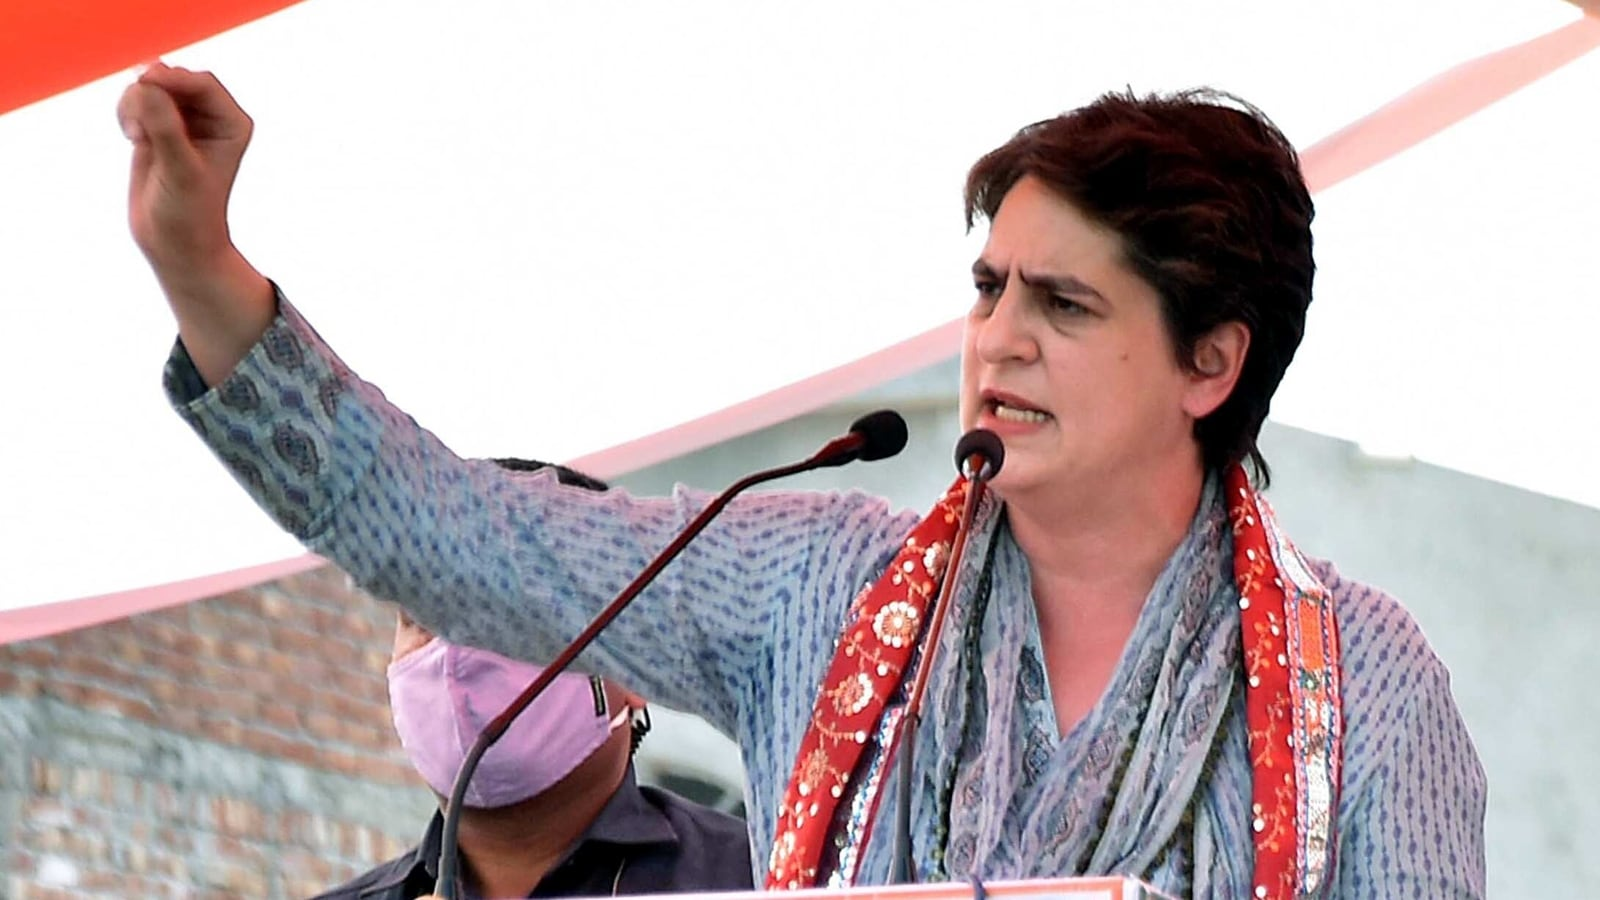 UP polls 2022: Expelled Congress leaders question Priyanka Vadra's leadership